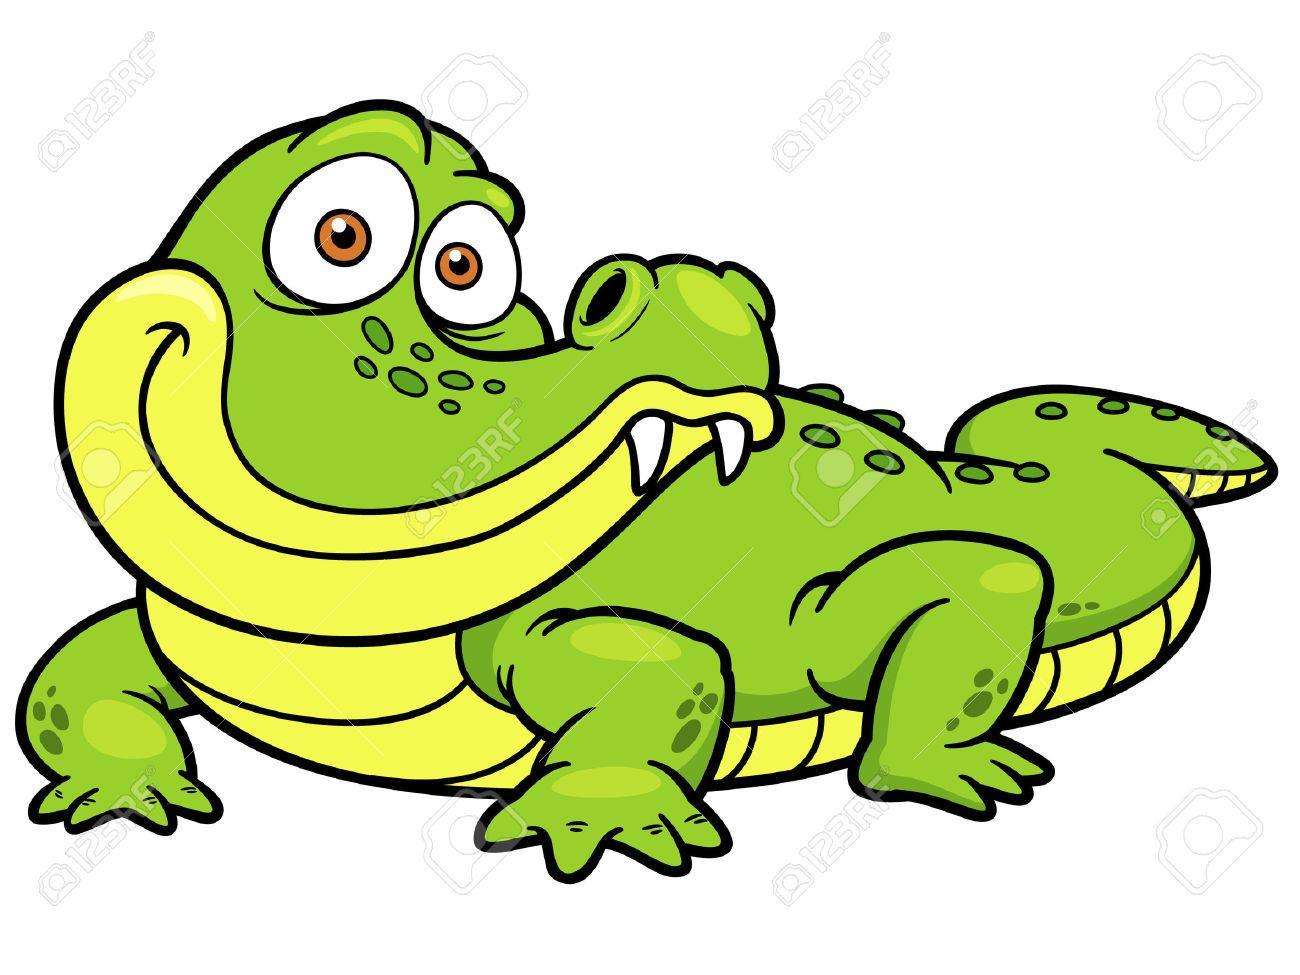 cute crocodile illustration - Google Search | sweet croc | Pinterest ...